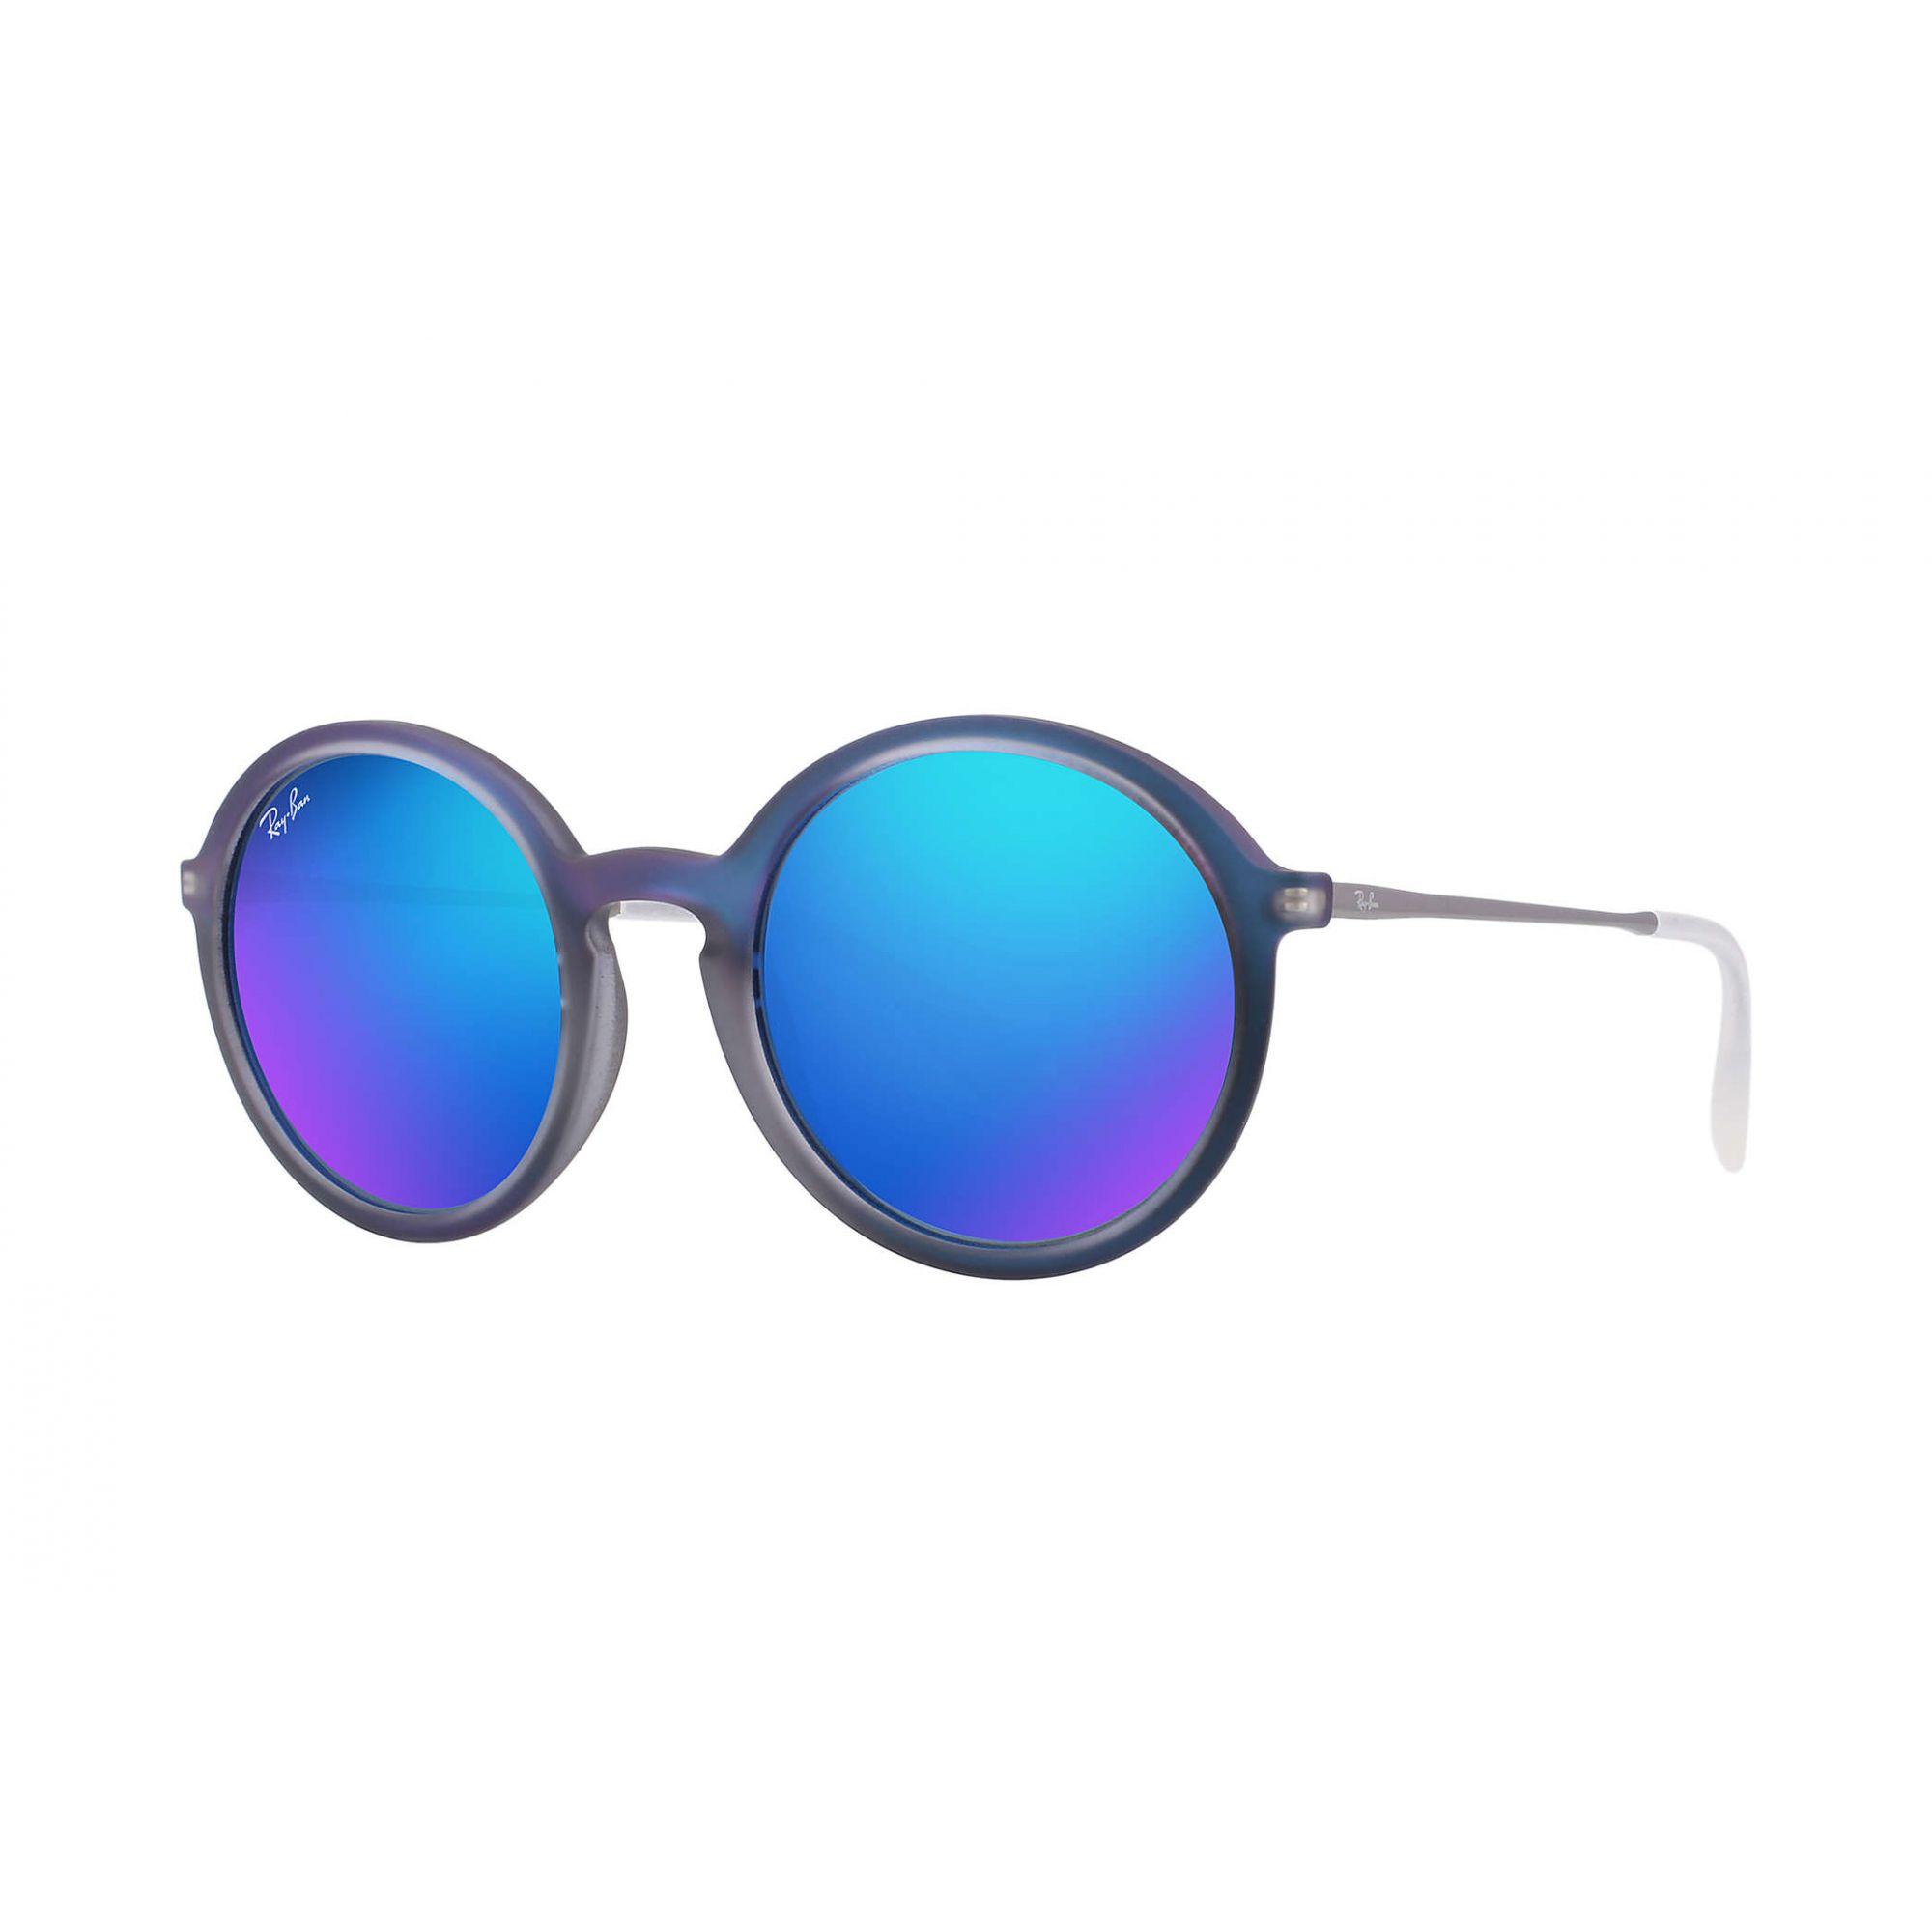 Óculos de Sol Feminino Ray-Ban Round Youngster Azul Espelhado